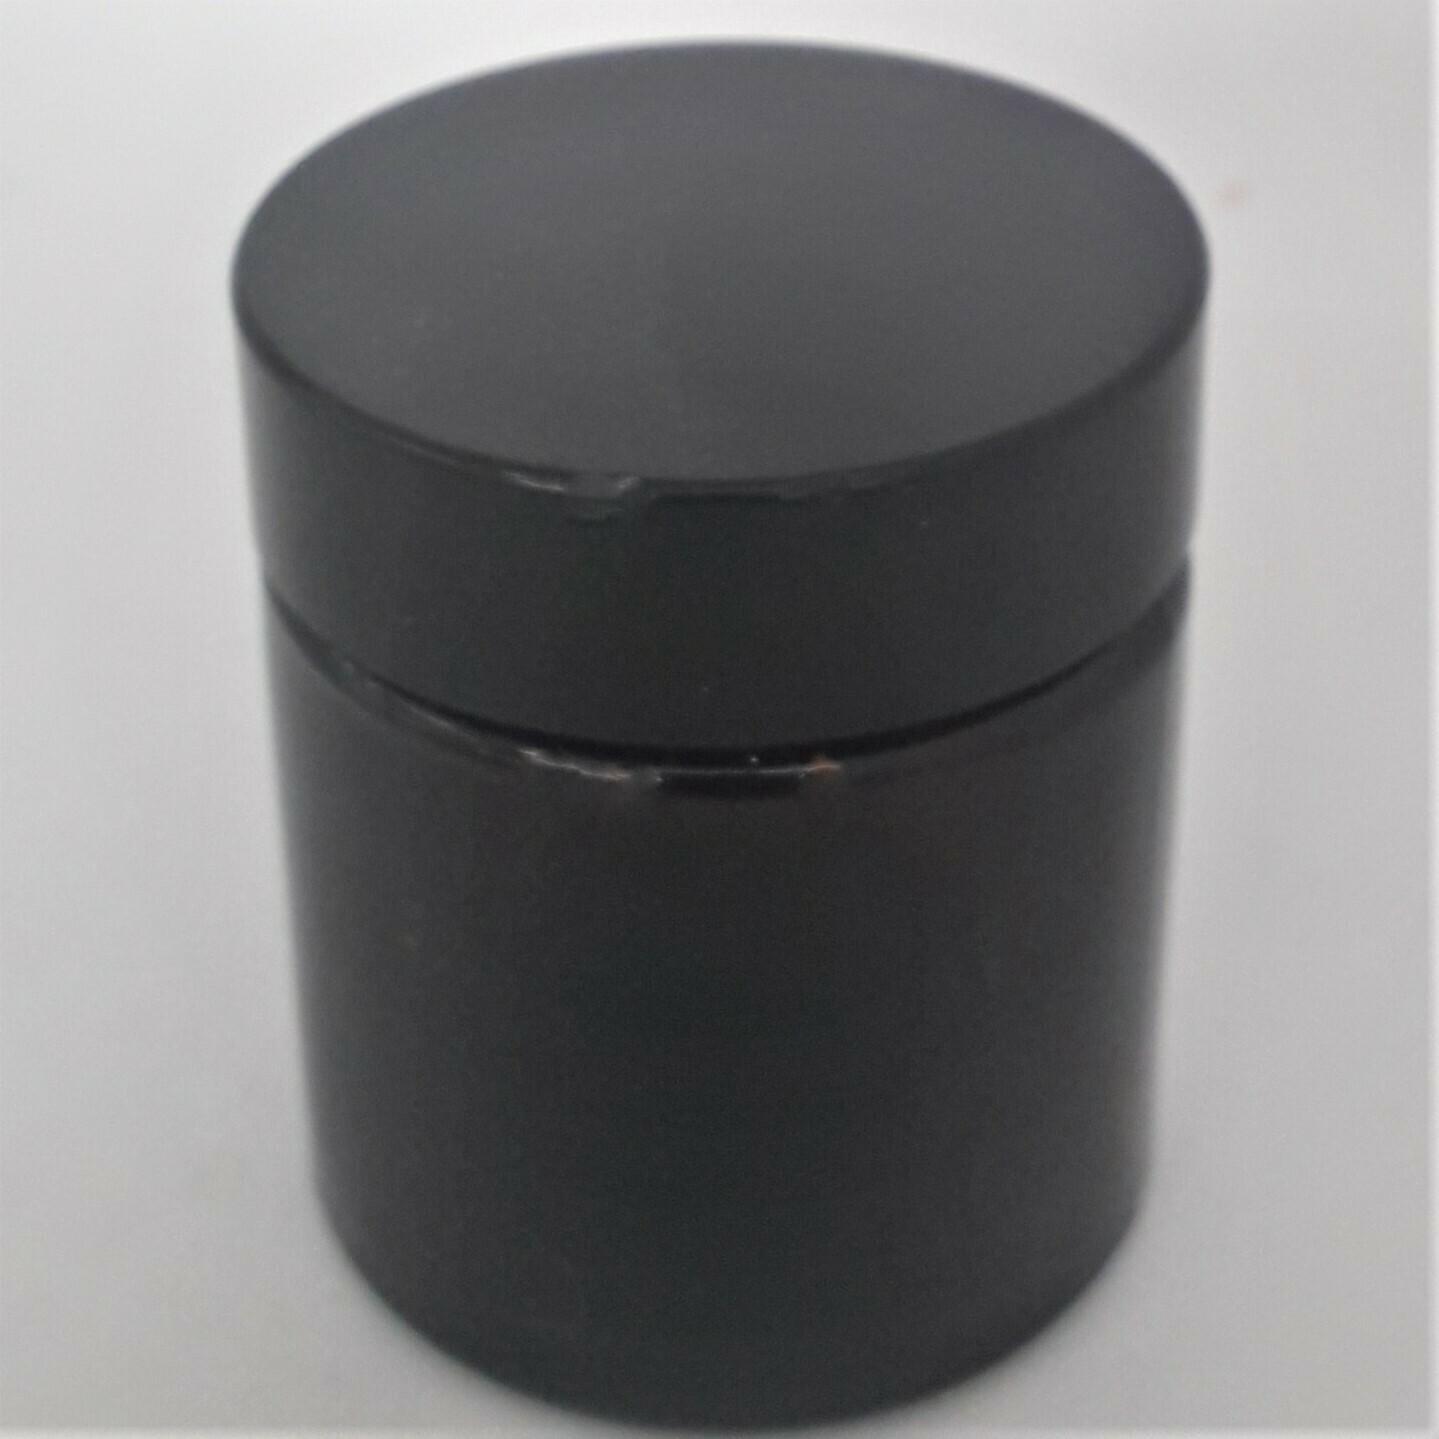 30ml Cosmetic Ointment Amber Glass Squat Jars